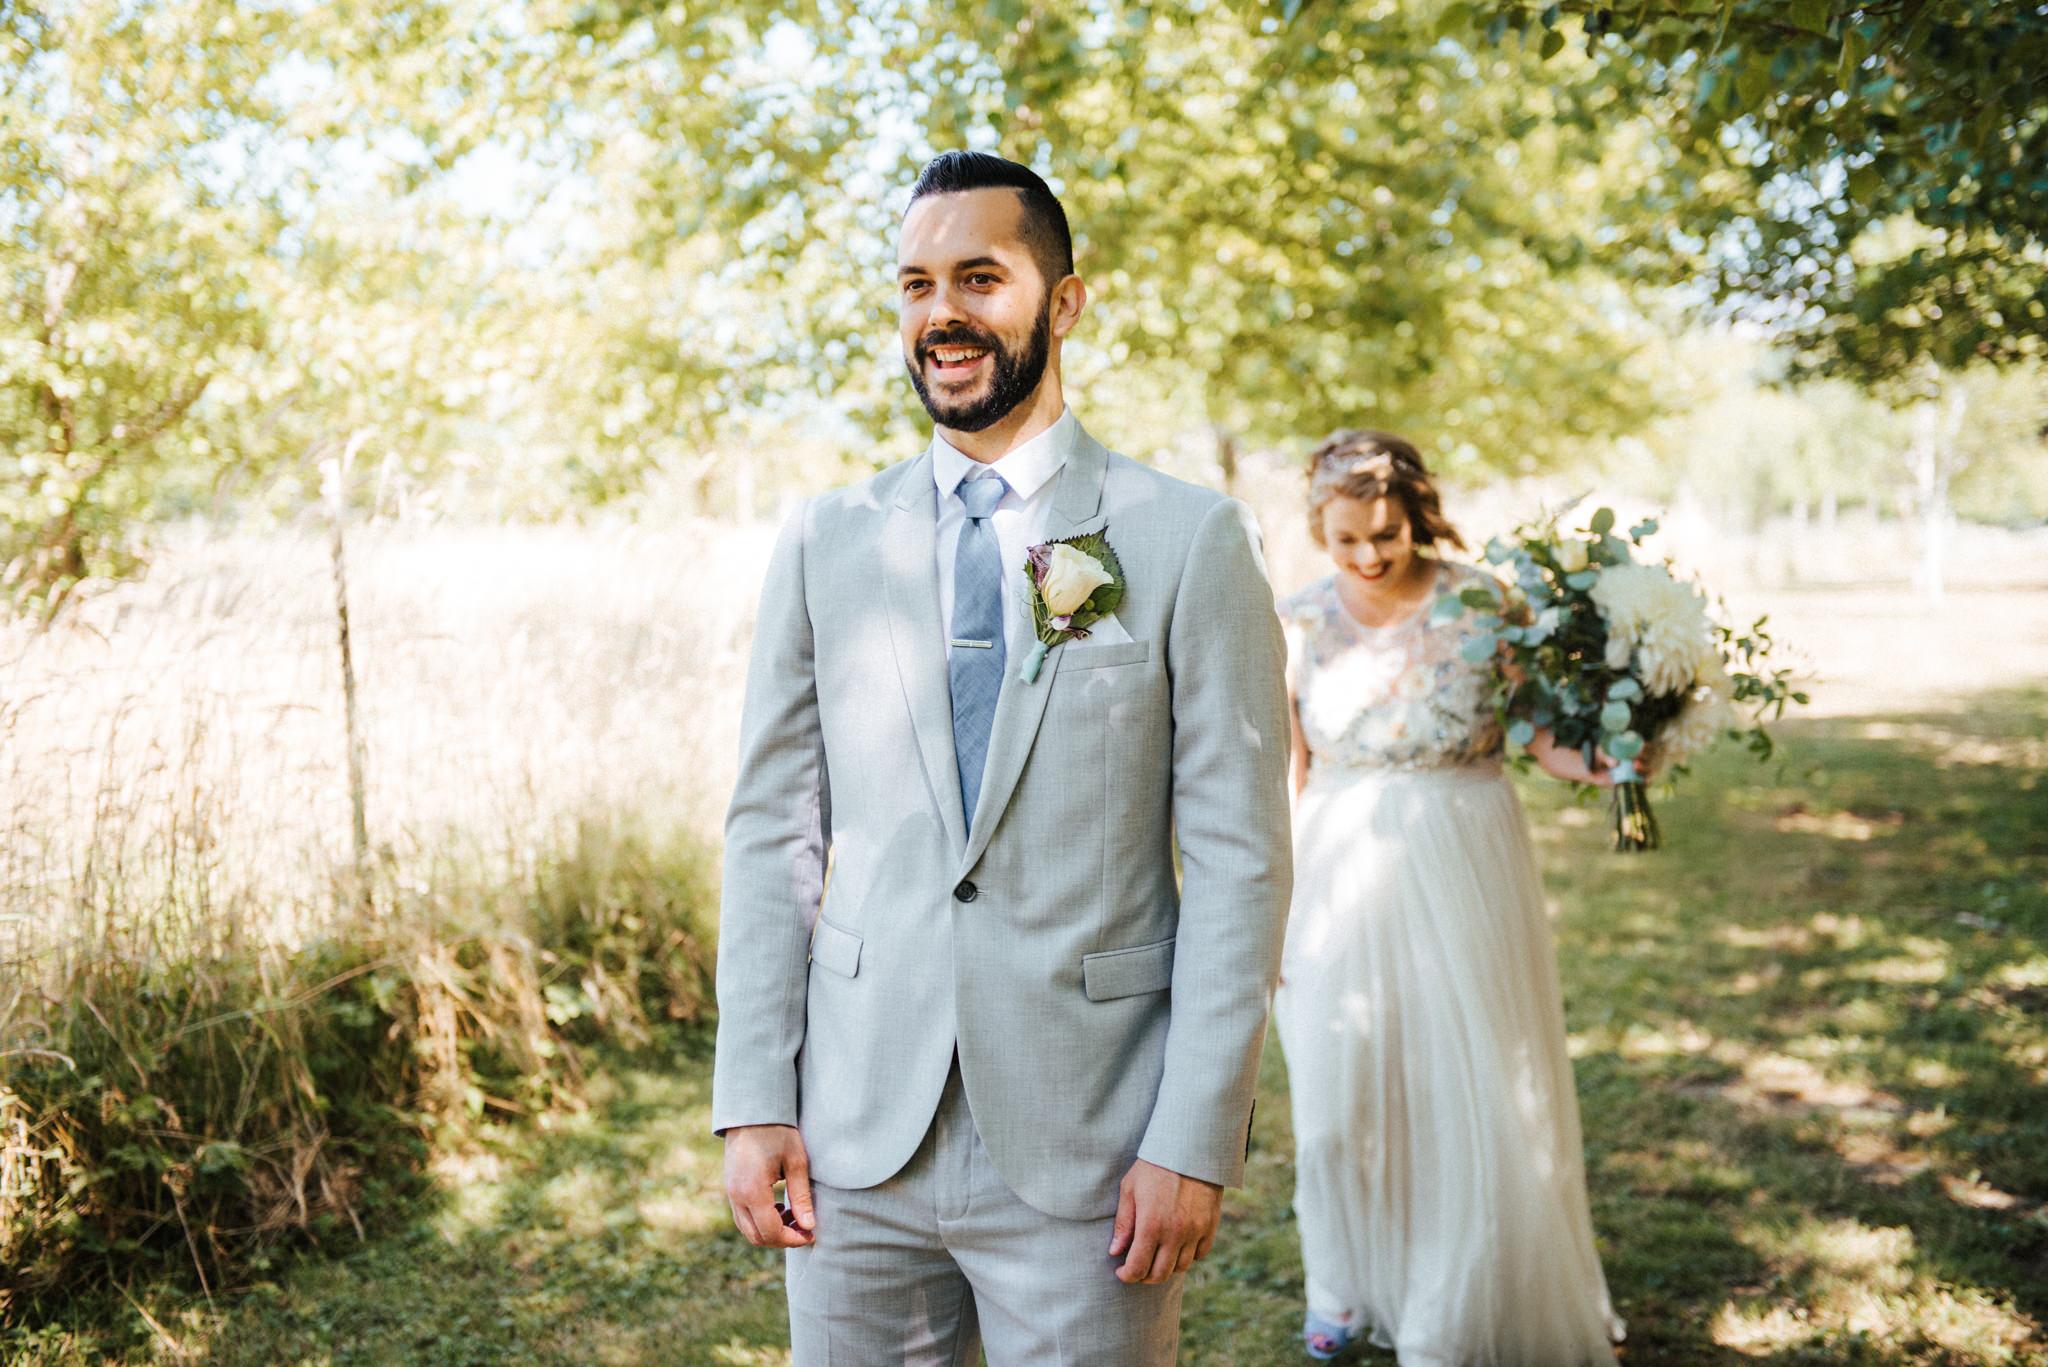 Amy Steven Seattle Wedding Photographer Vishal Goklani_019.jpg